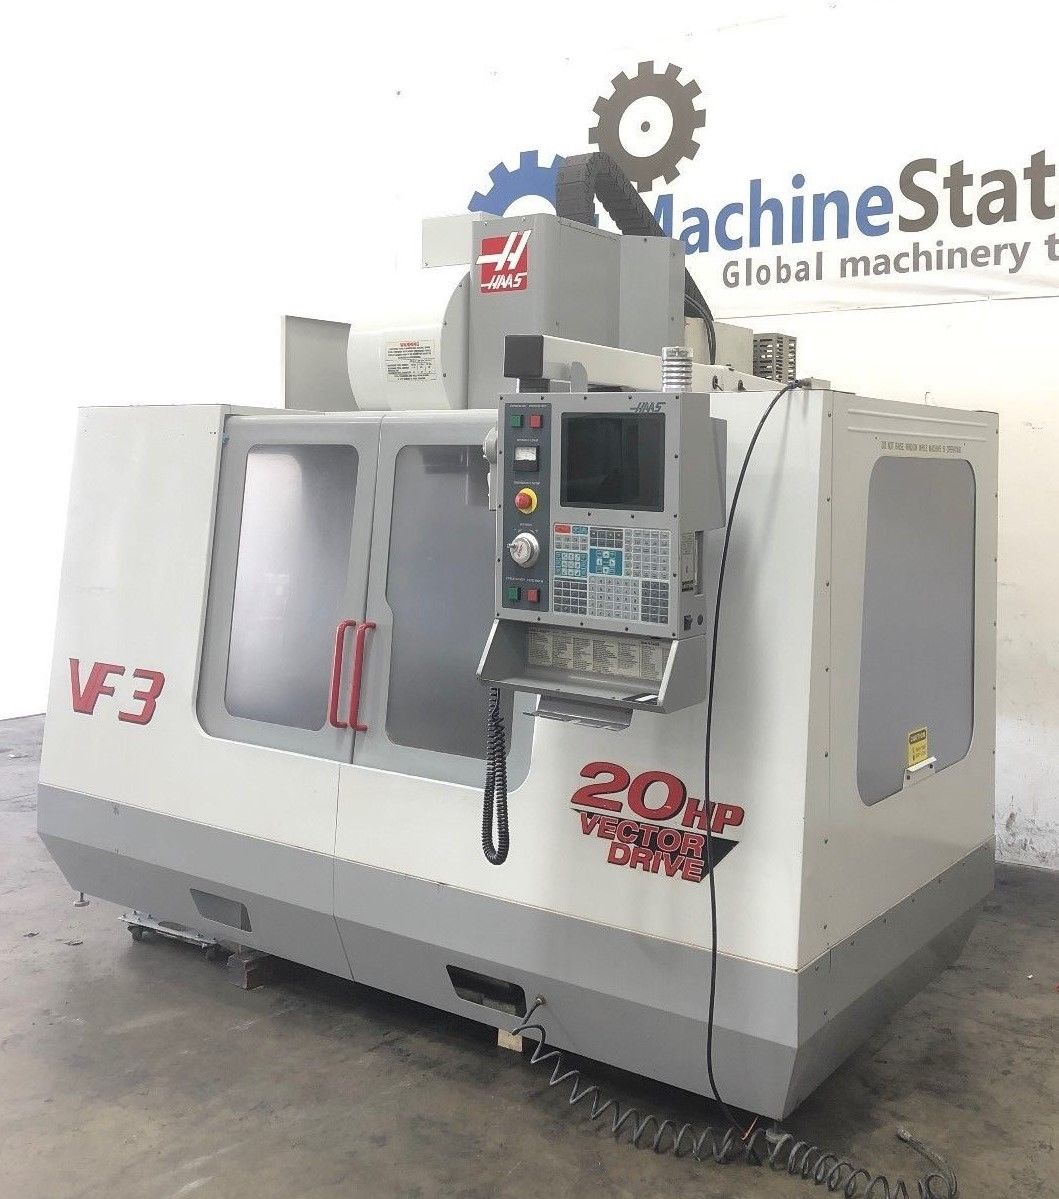 HAAS VF-3B CNC Vertical Machining Center - MachineStation